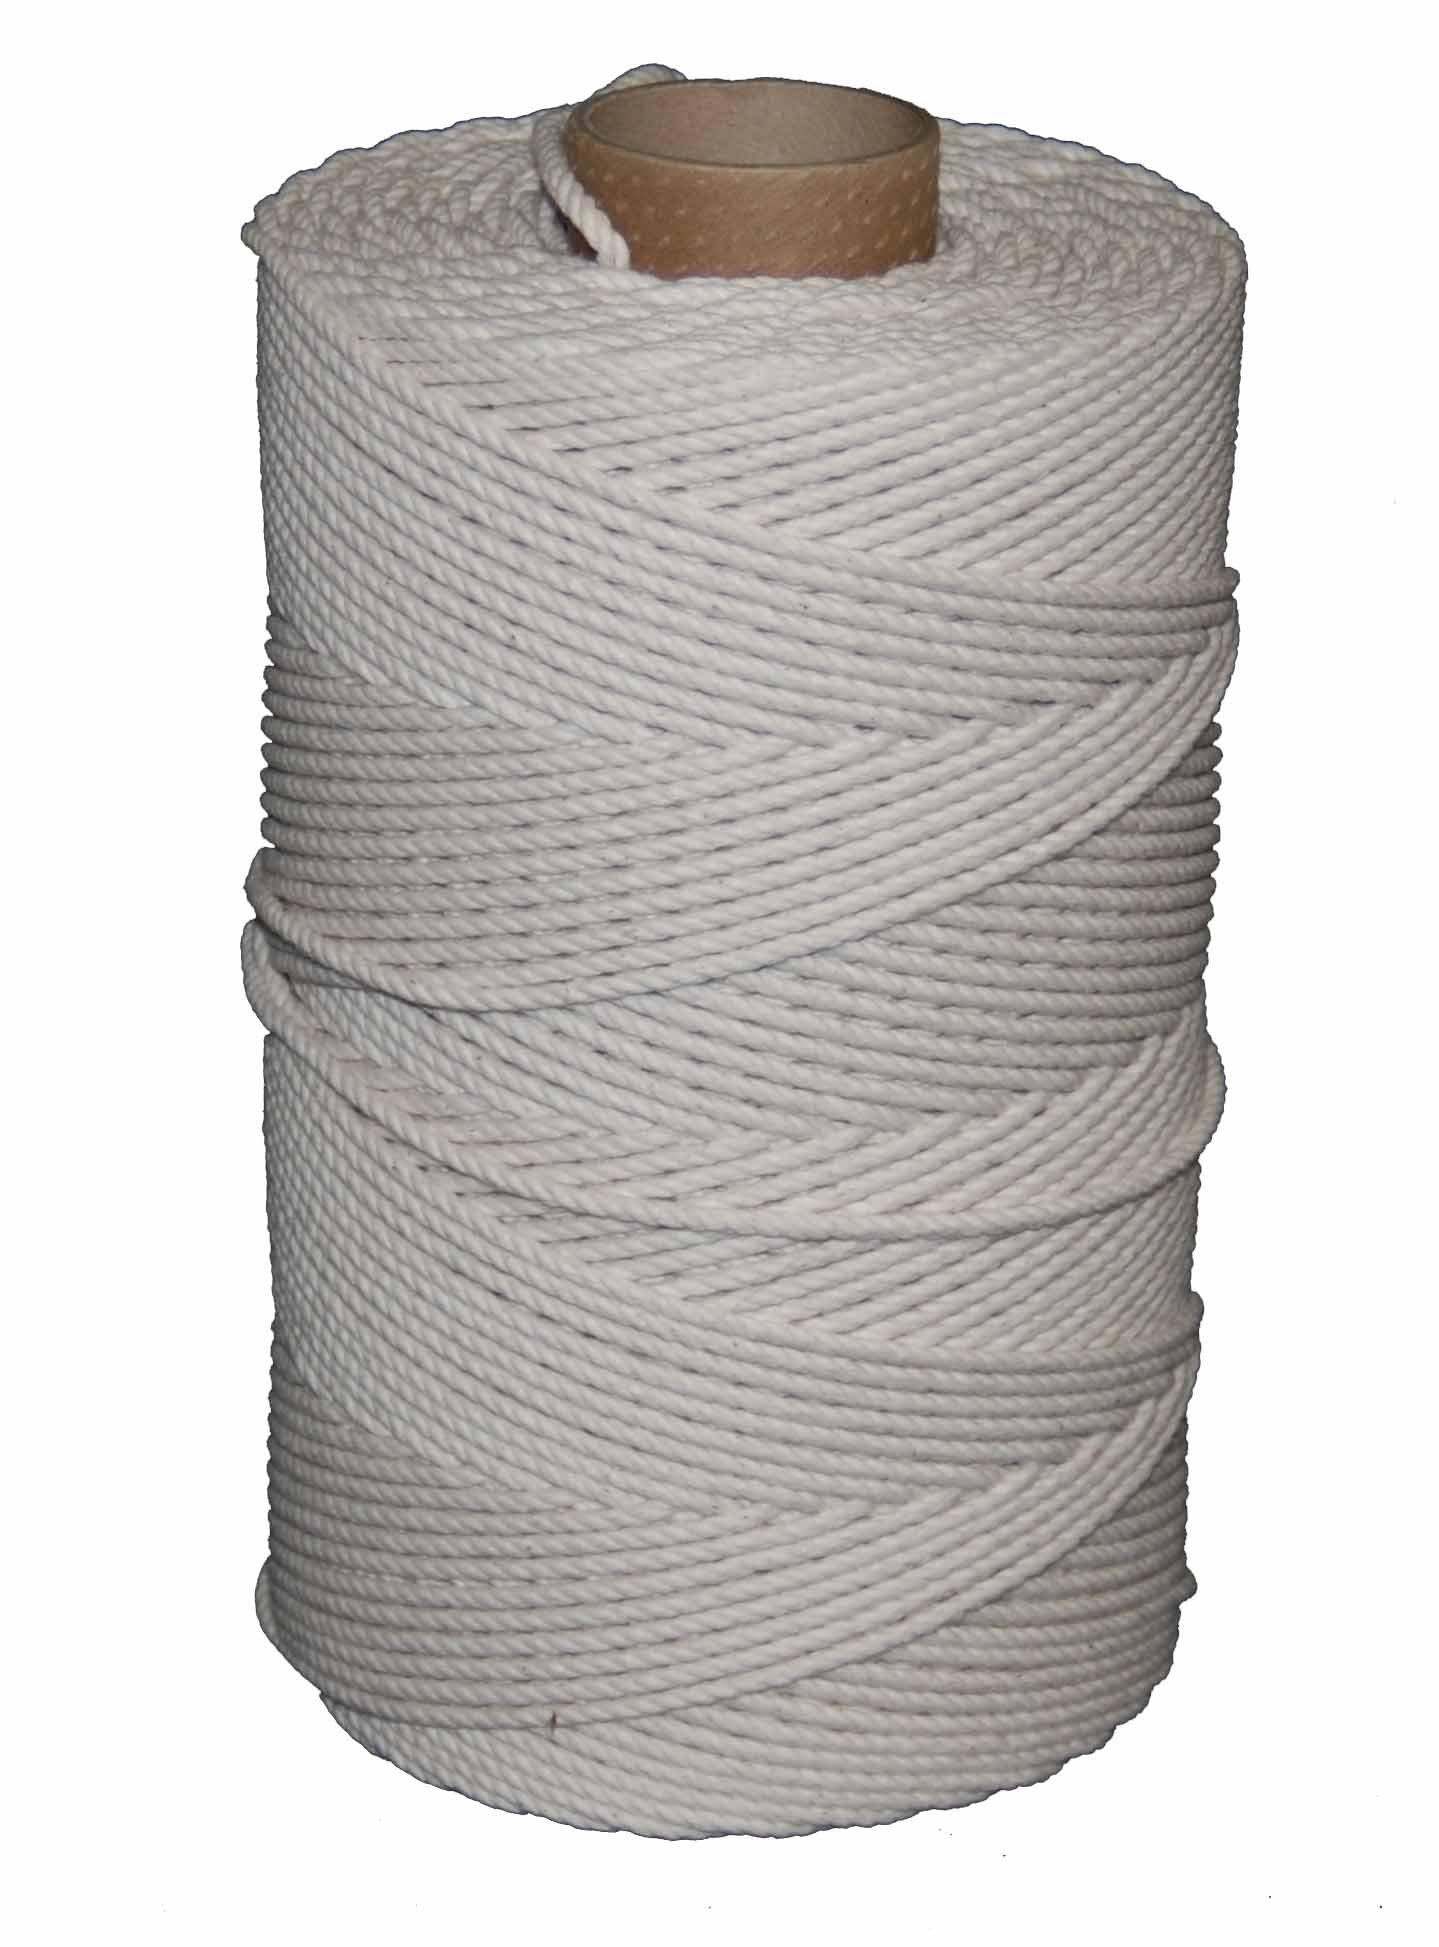 T.W Evans Cordage 03-845 Number-84 Cotton Seine Mason Line with 800-Feet Tube